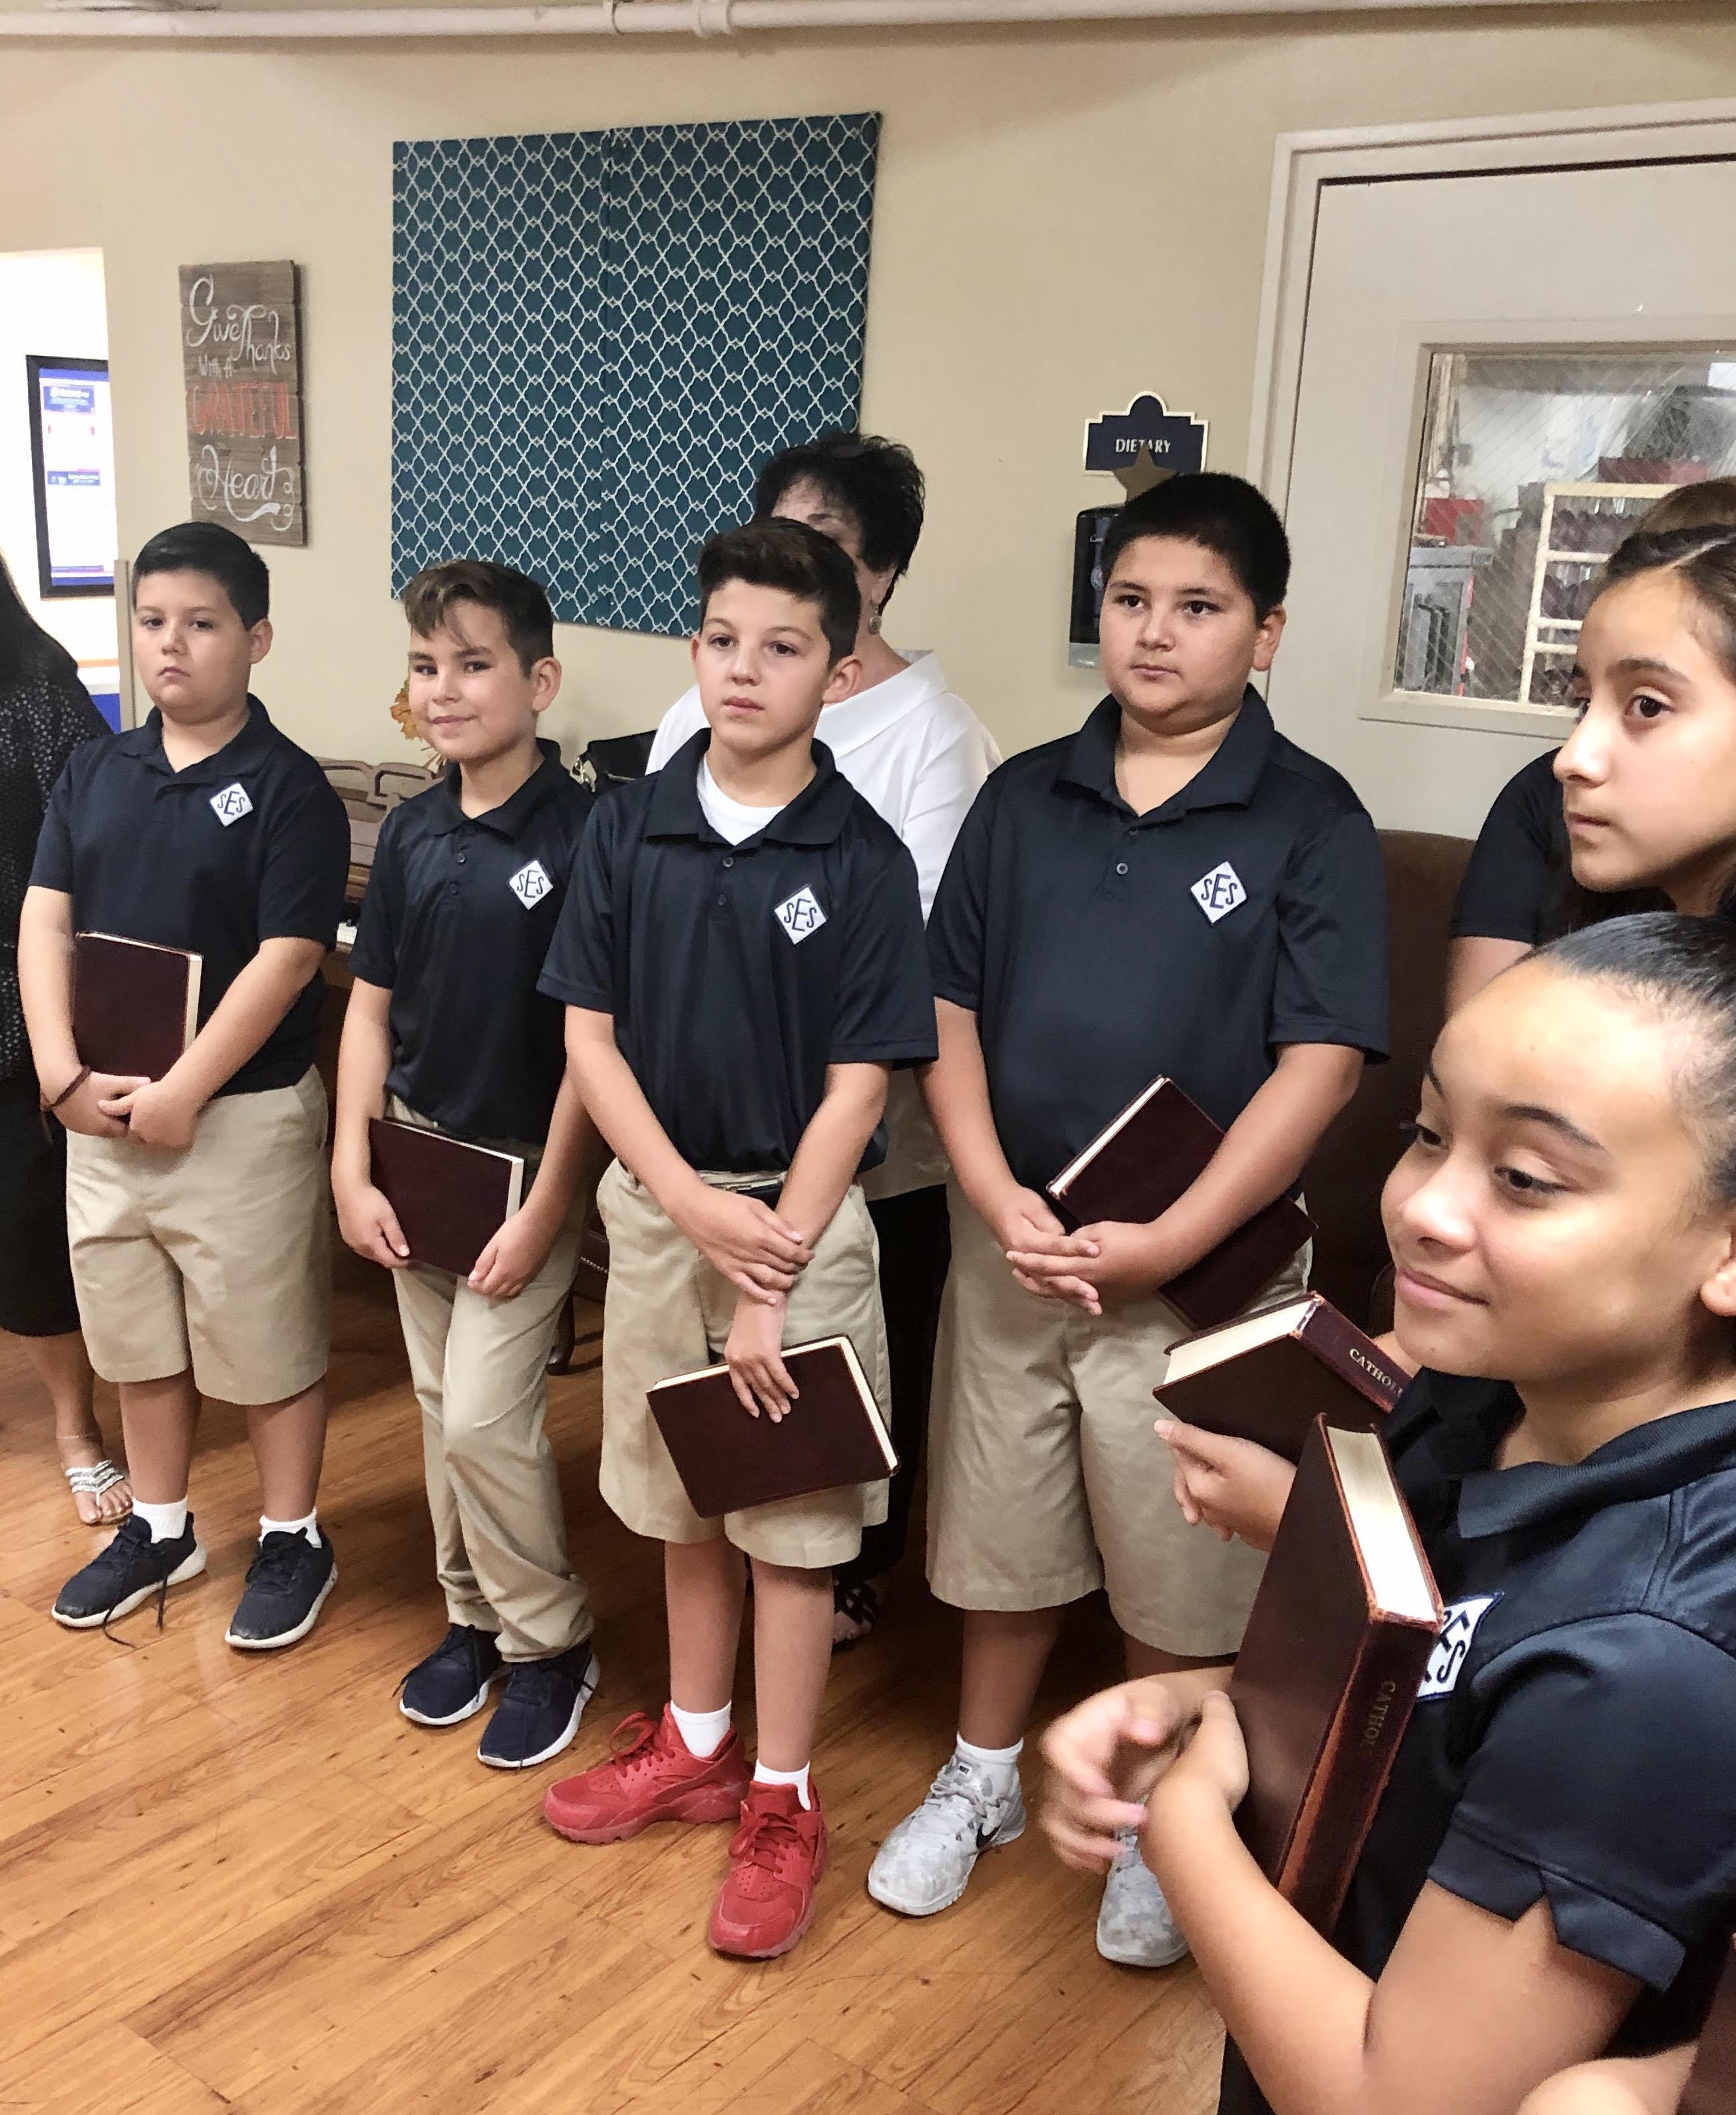 Choir at the Nursing Home